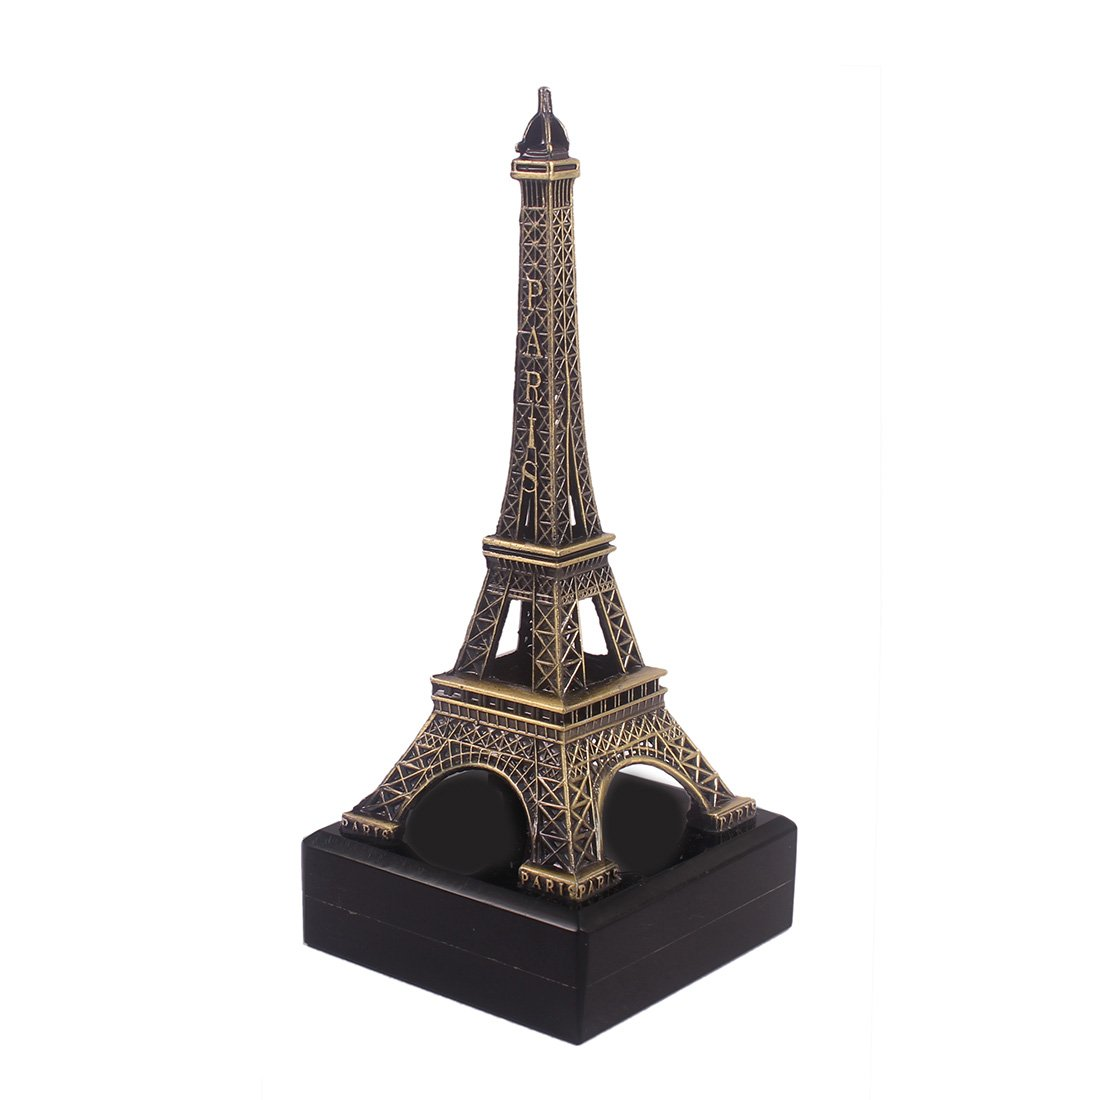 Kebica Paris Eiffel Tower Art Statue Model Paperweight Desk Decoration Gift (B074XWBVJB) Amazon Price History, Amazon Price Tracker